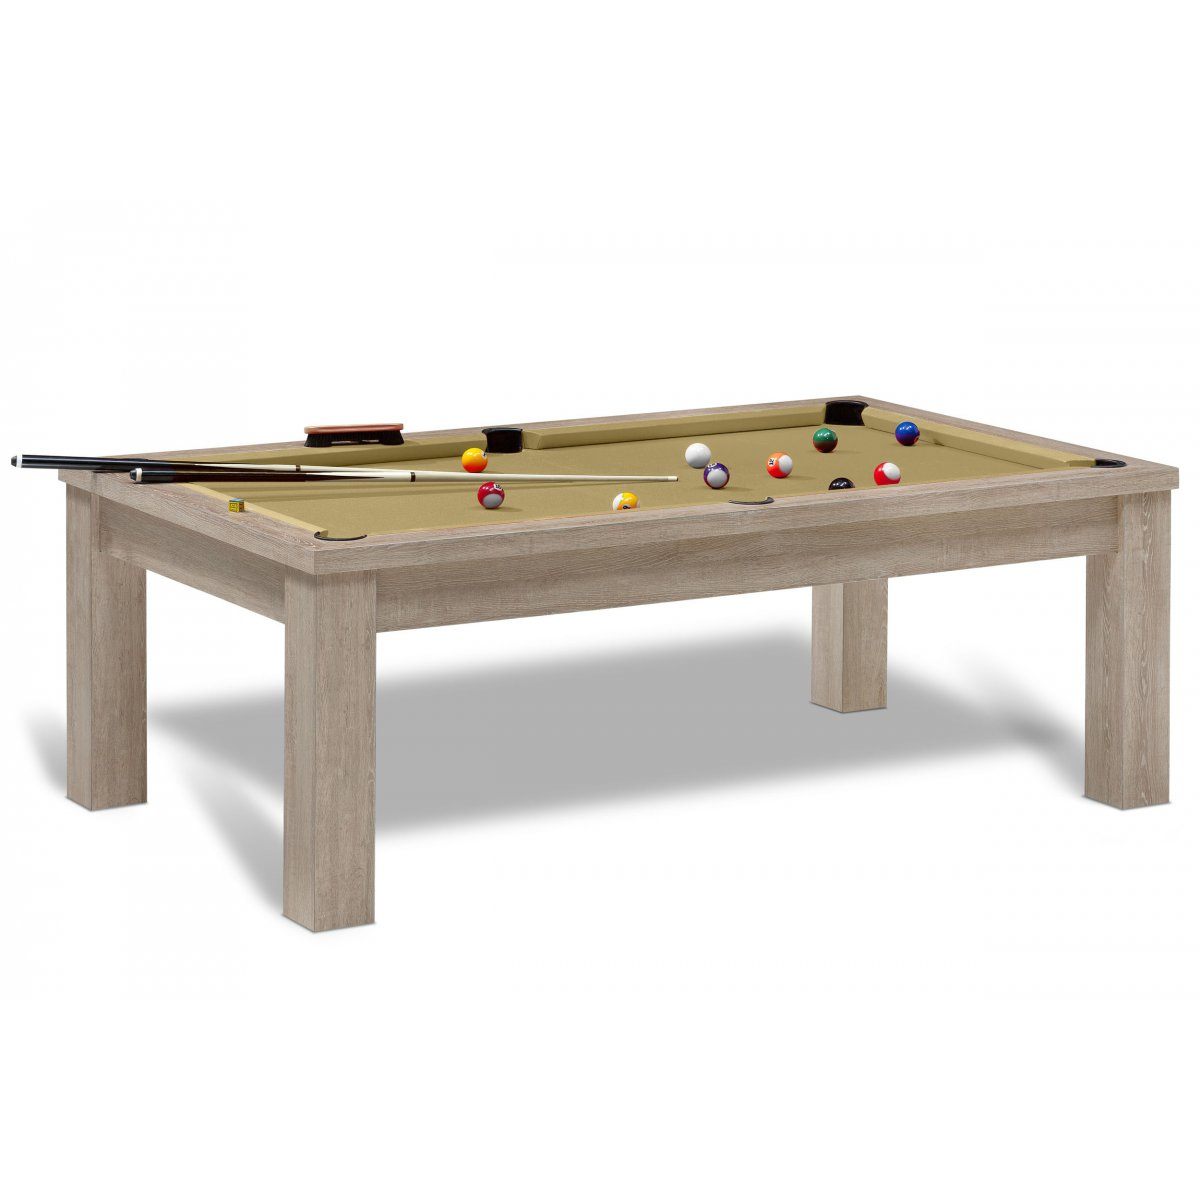 Billard am ricain billard table personnalisable jeux us - Taille table billard ...